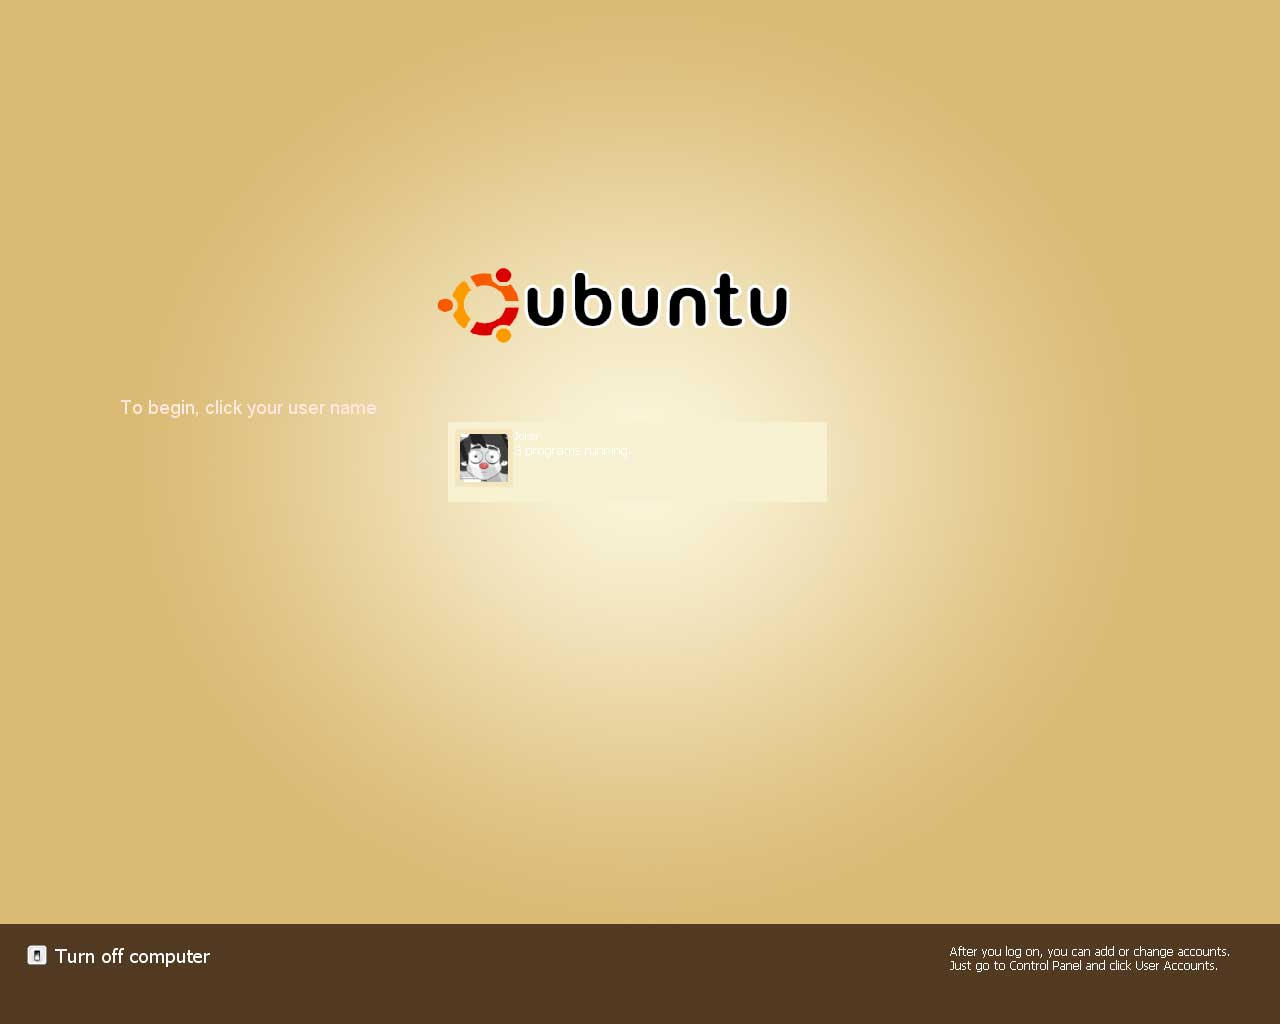 Ubuntu Logon by Misery-Joker